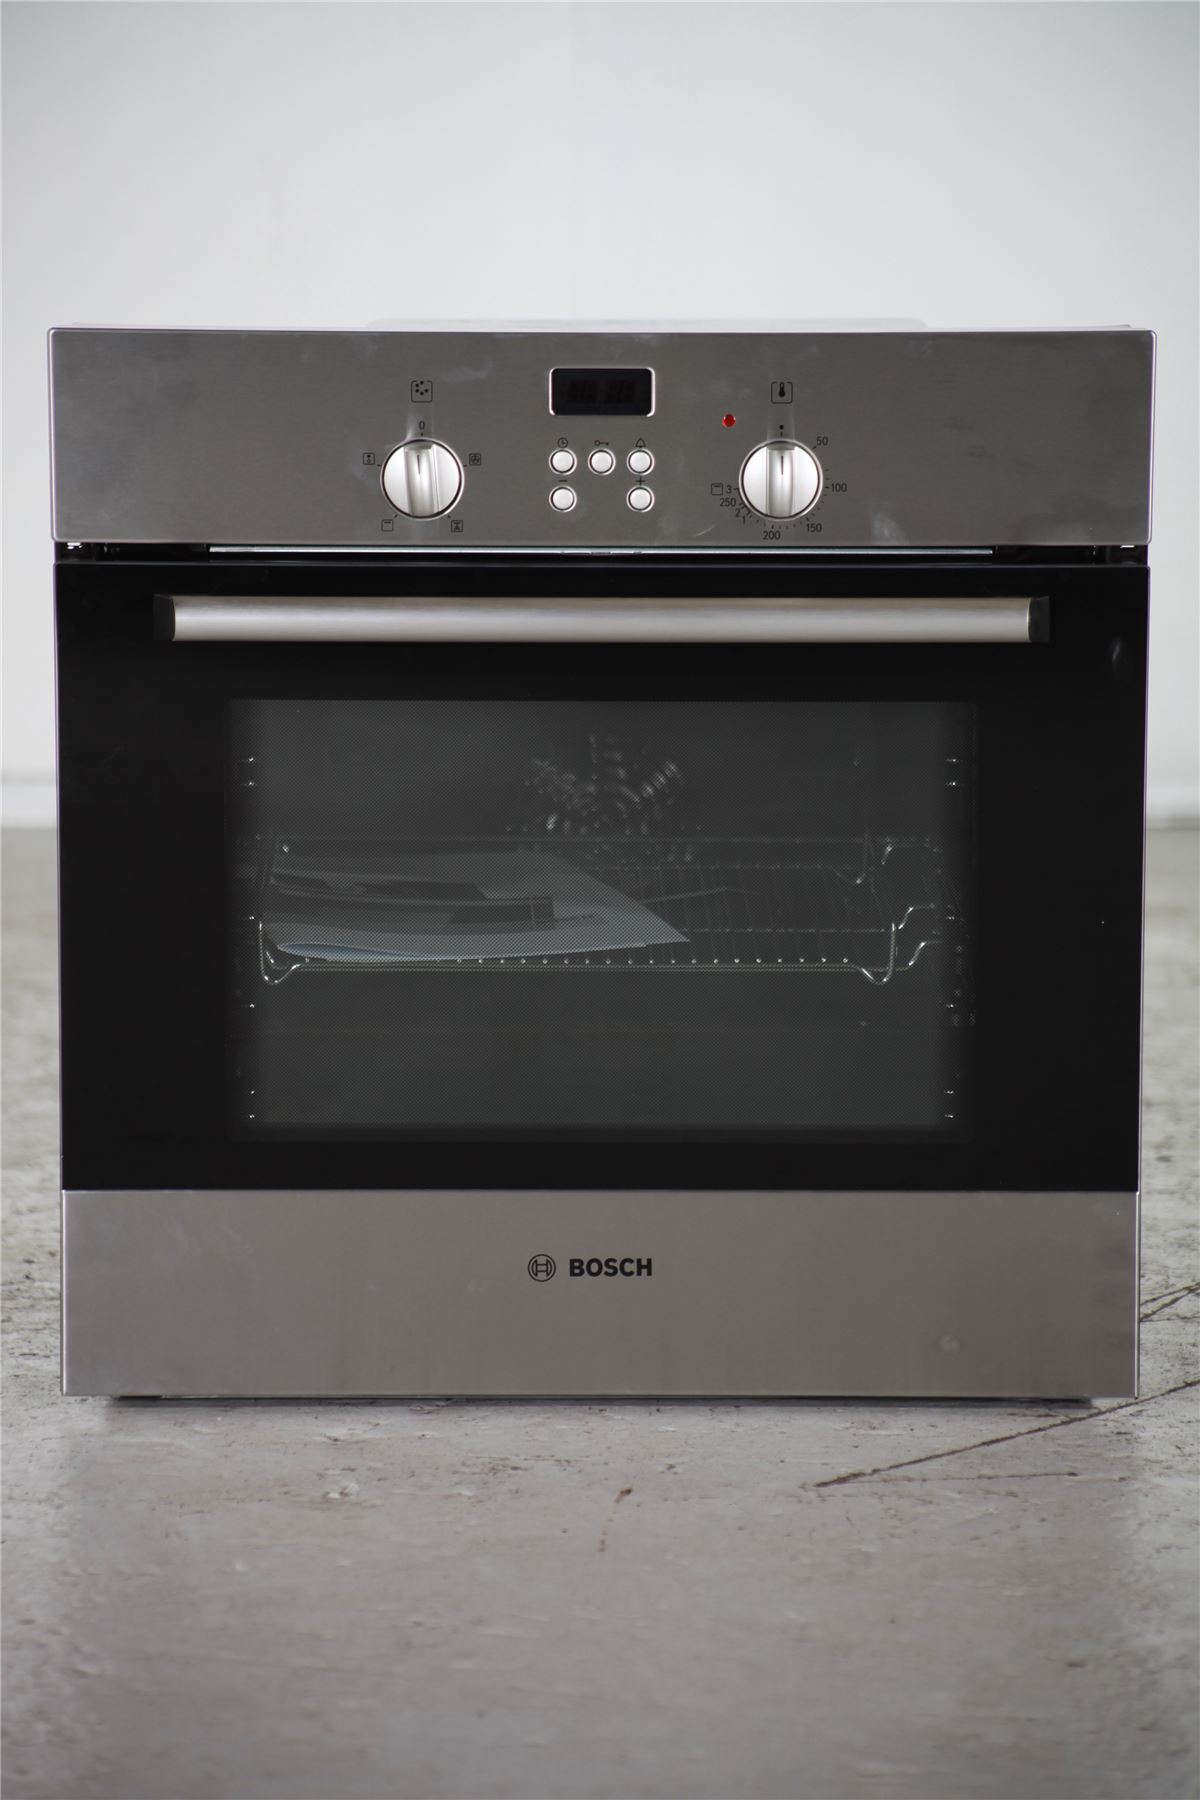 User manual Bosch MBS533BS0B Oven